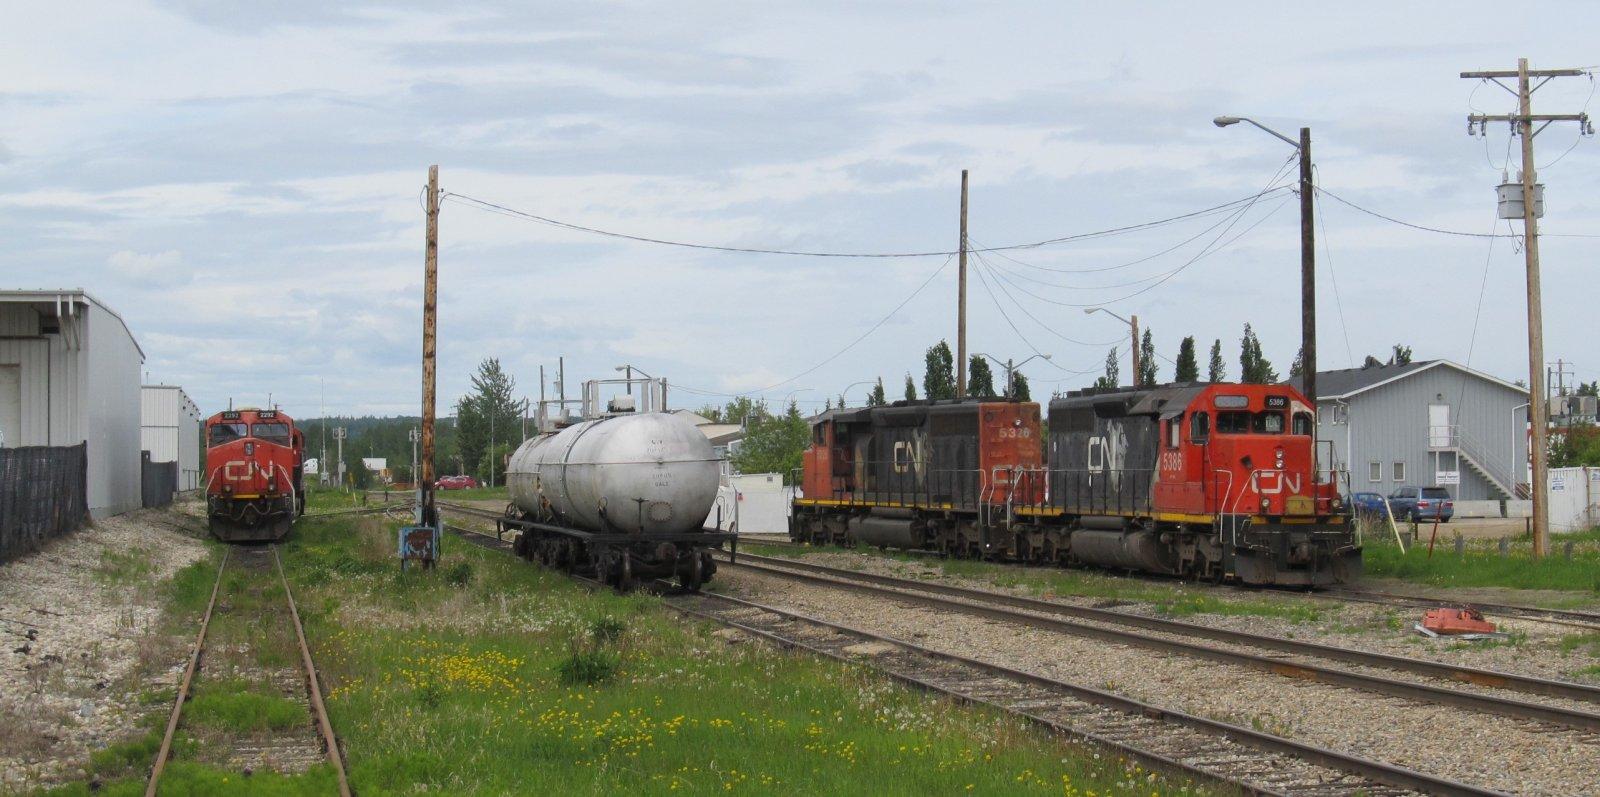 Yard_06-08-2020 (1).jpg